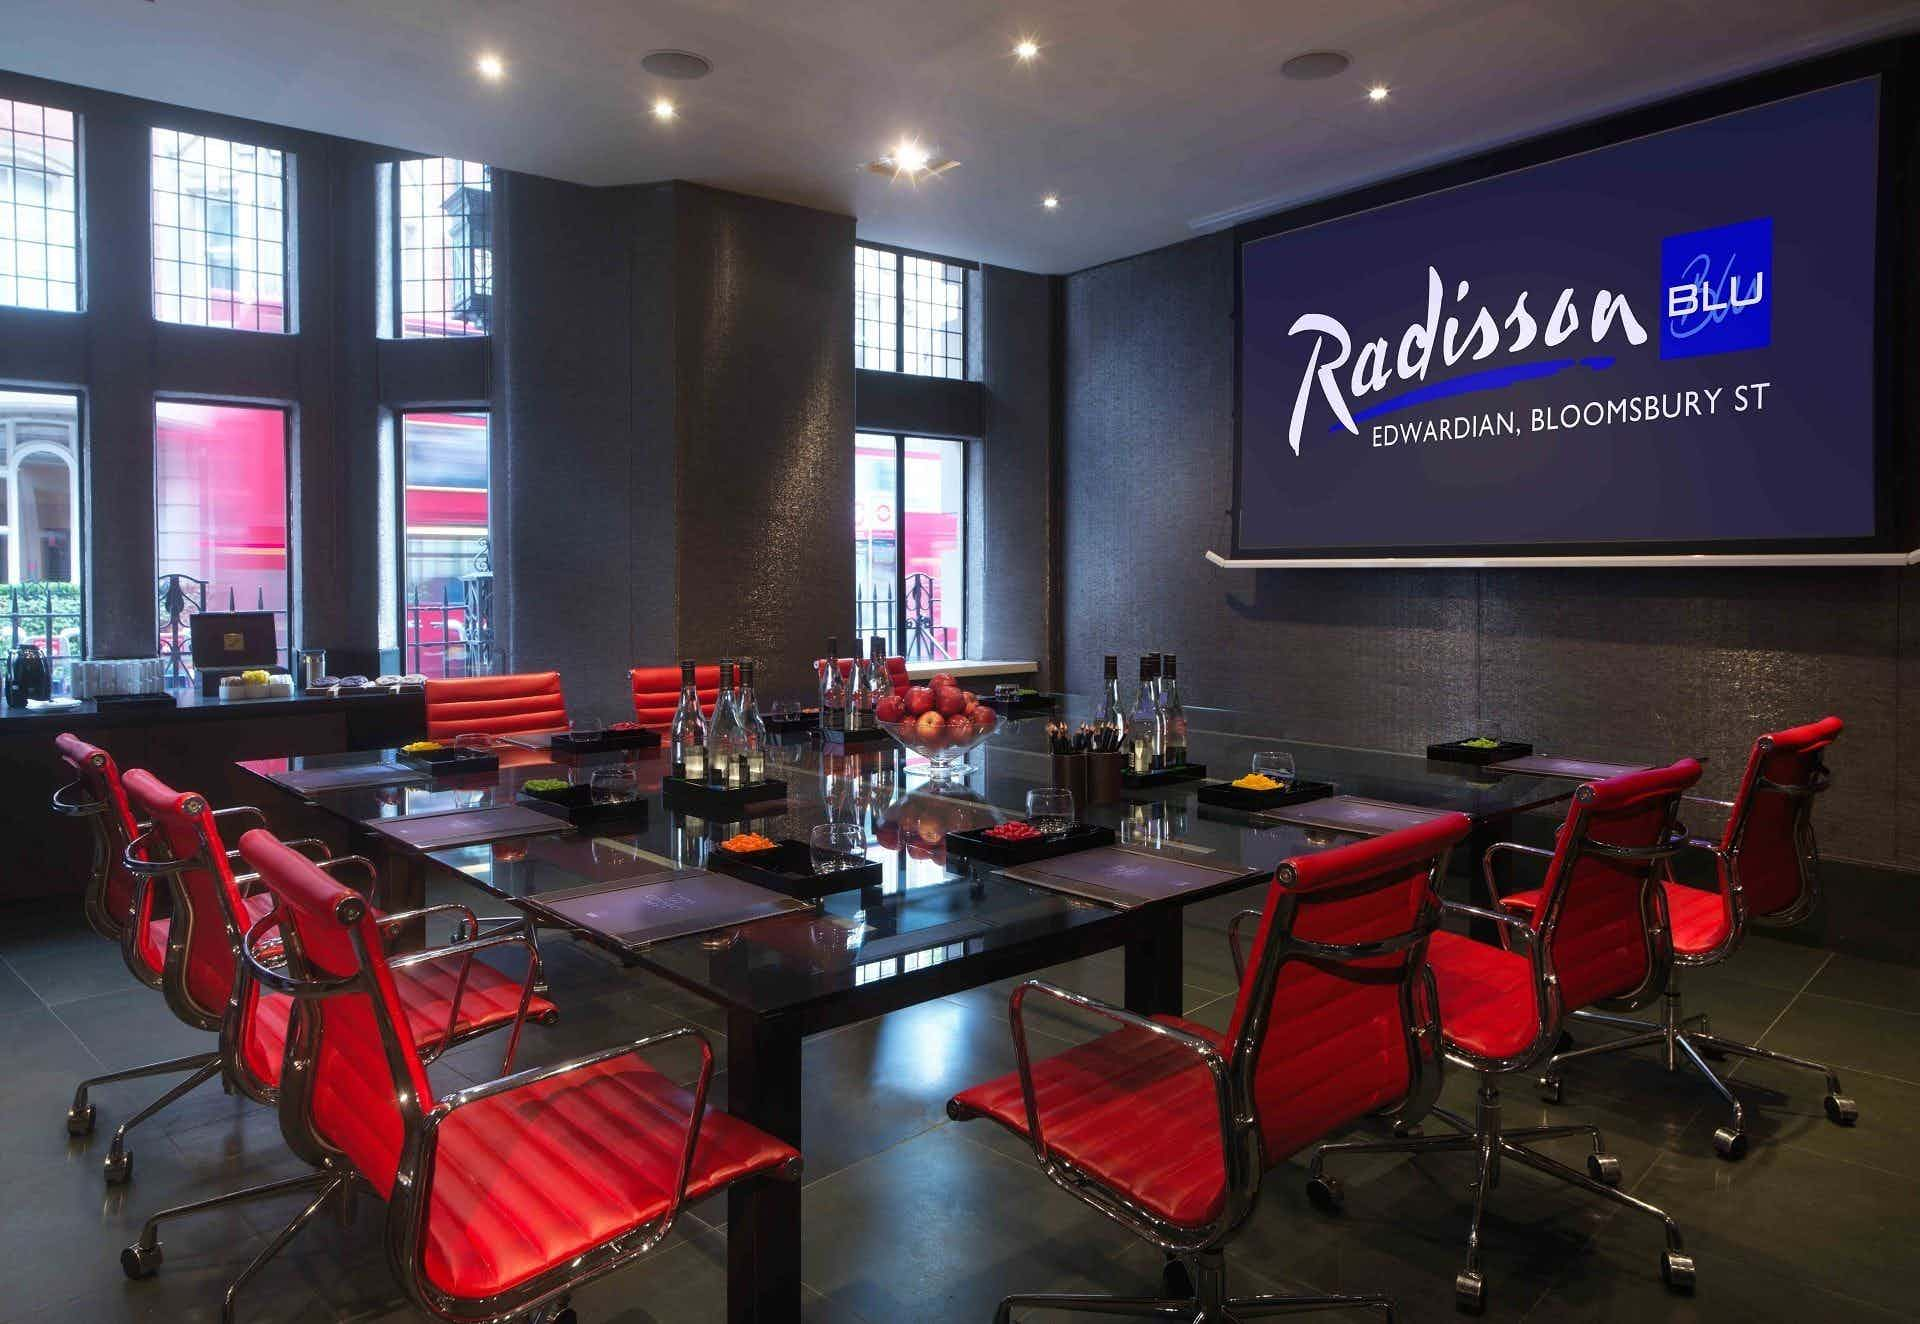 Private Room 1, Radisson Blu Edwardian, Bloomsbury Street